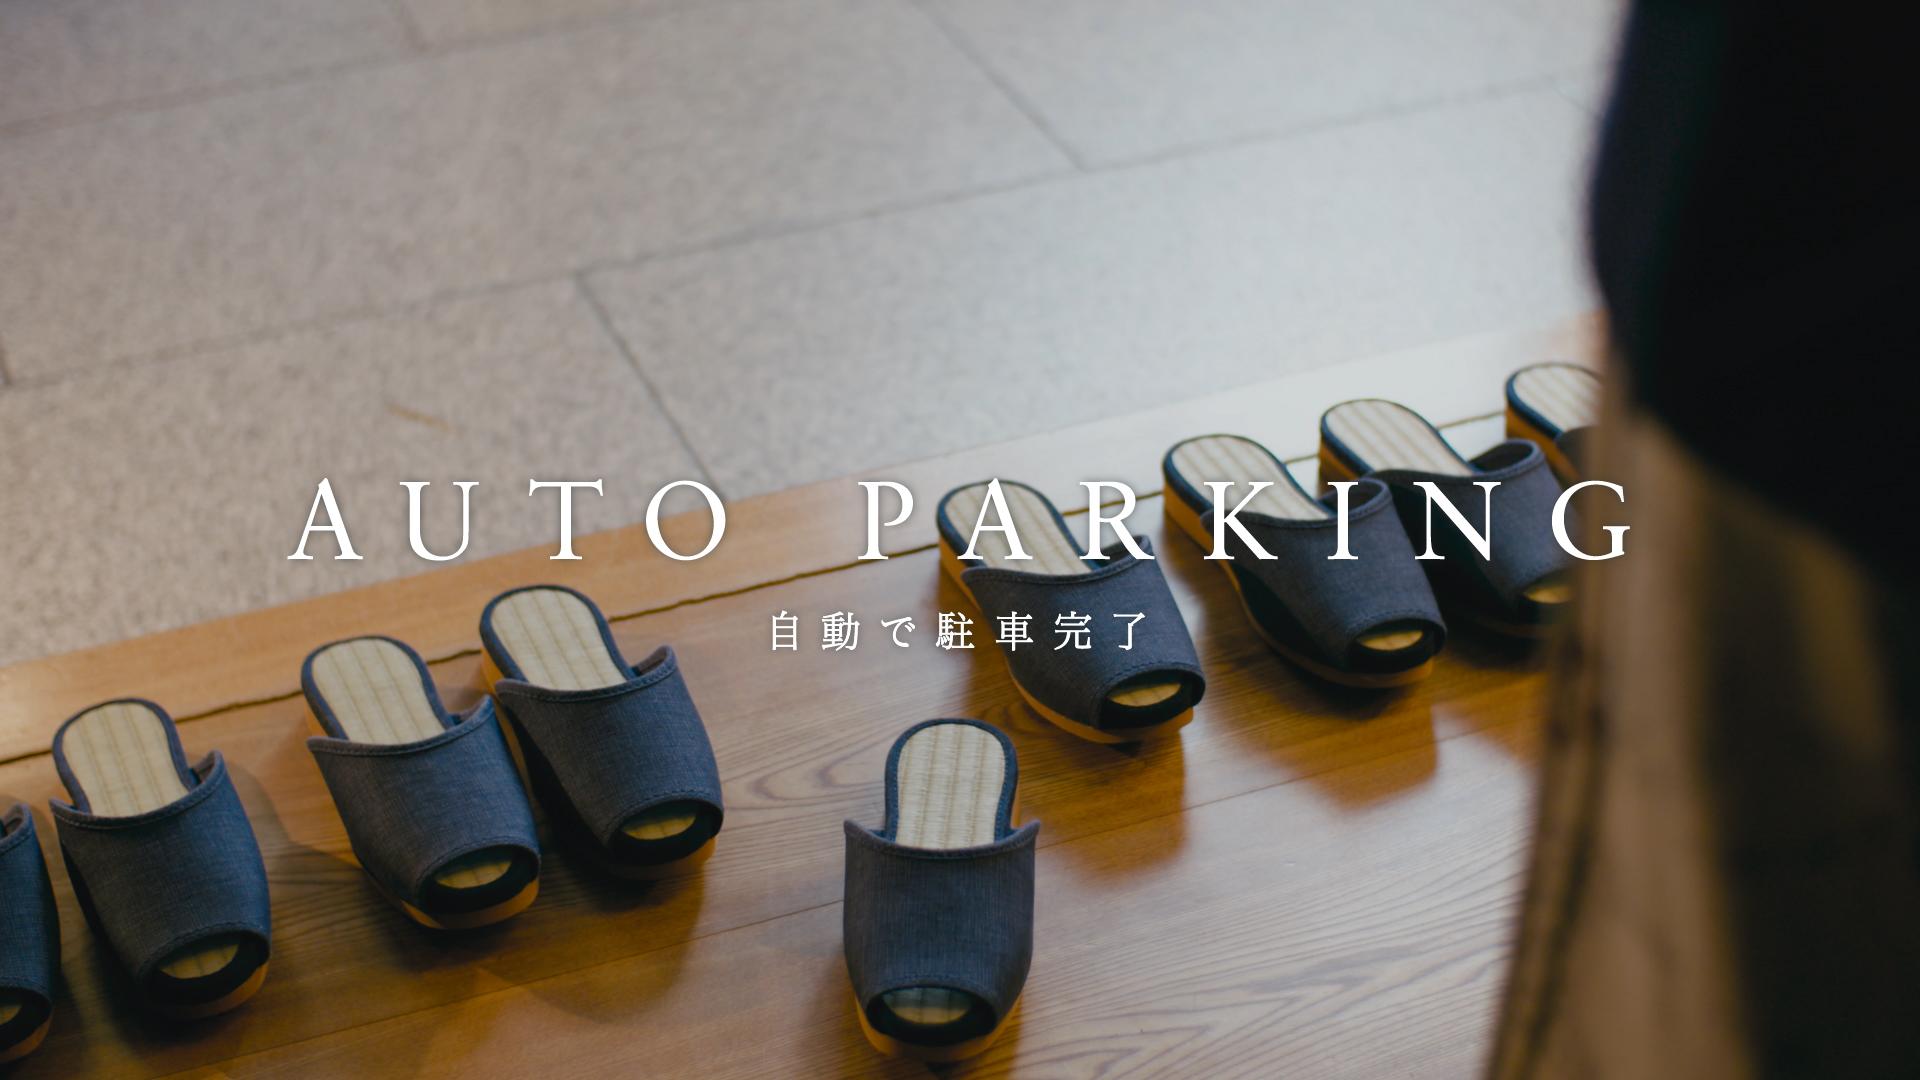 Домашние тапочки Nissan ProPILOT Park Ryokan